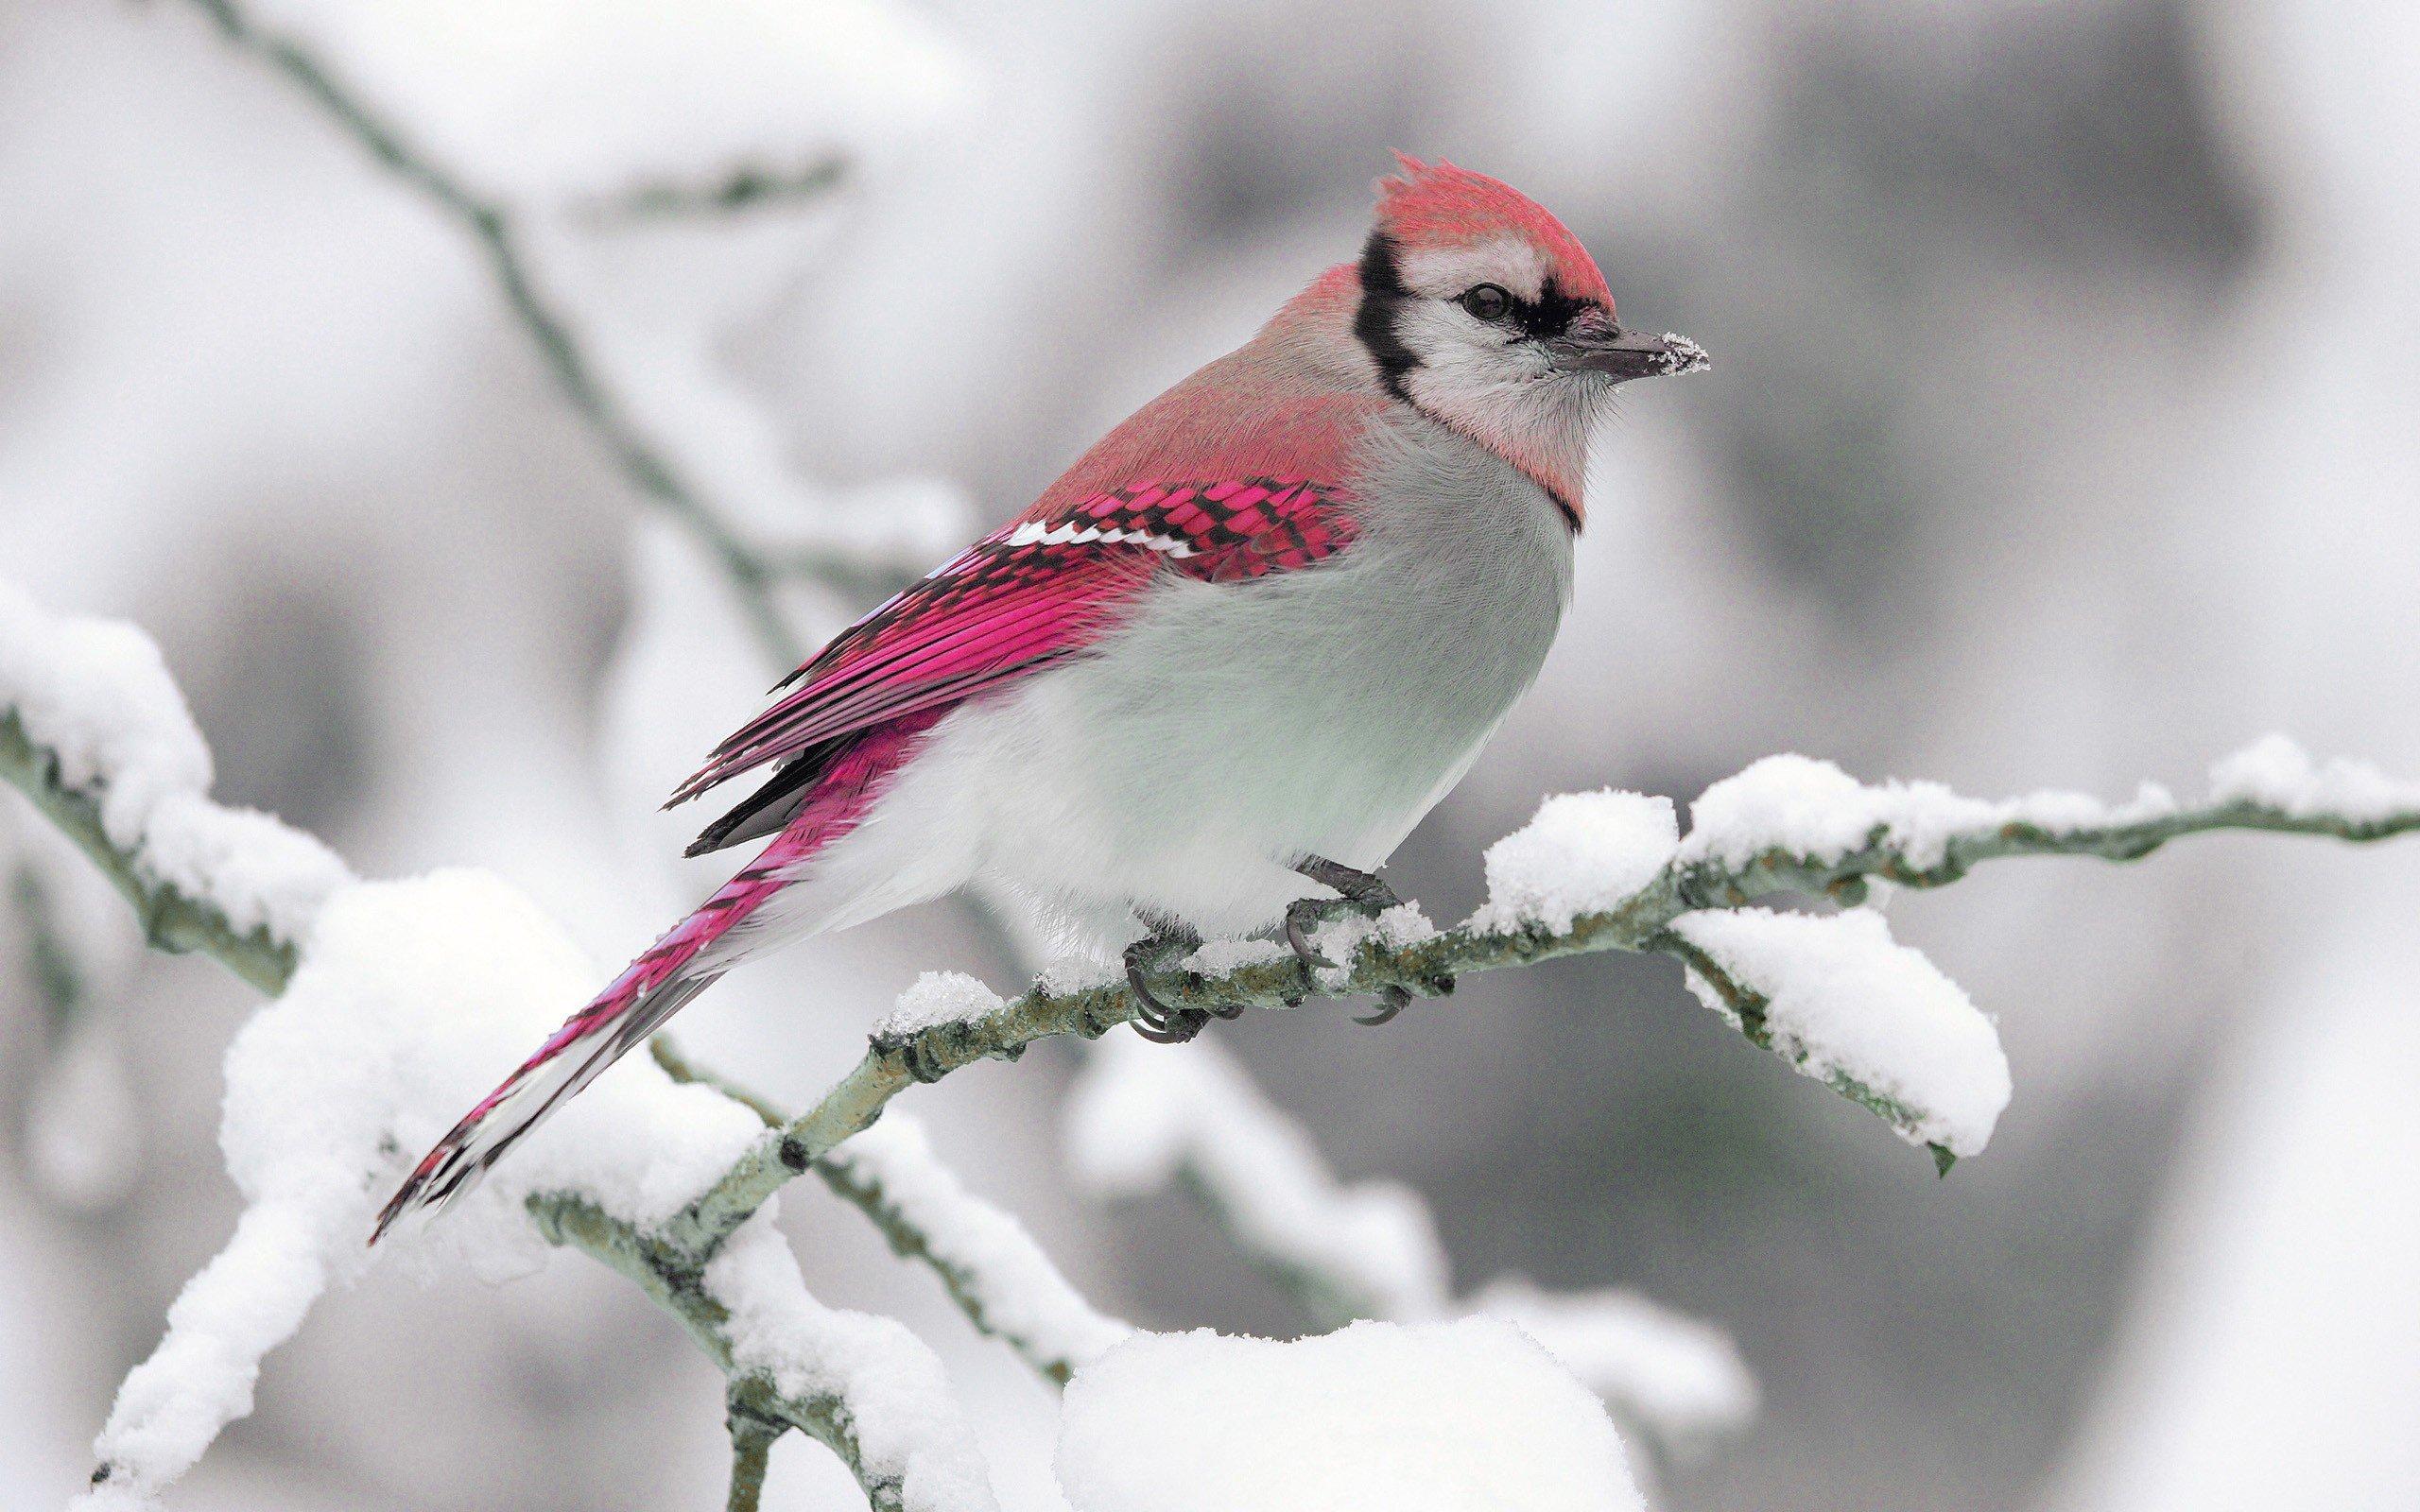 Winter bird images - photo#9